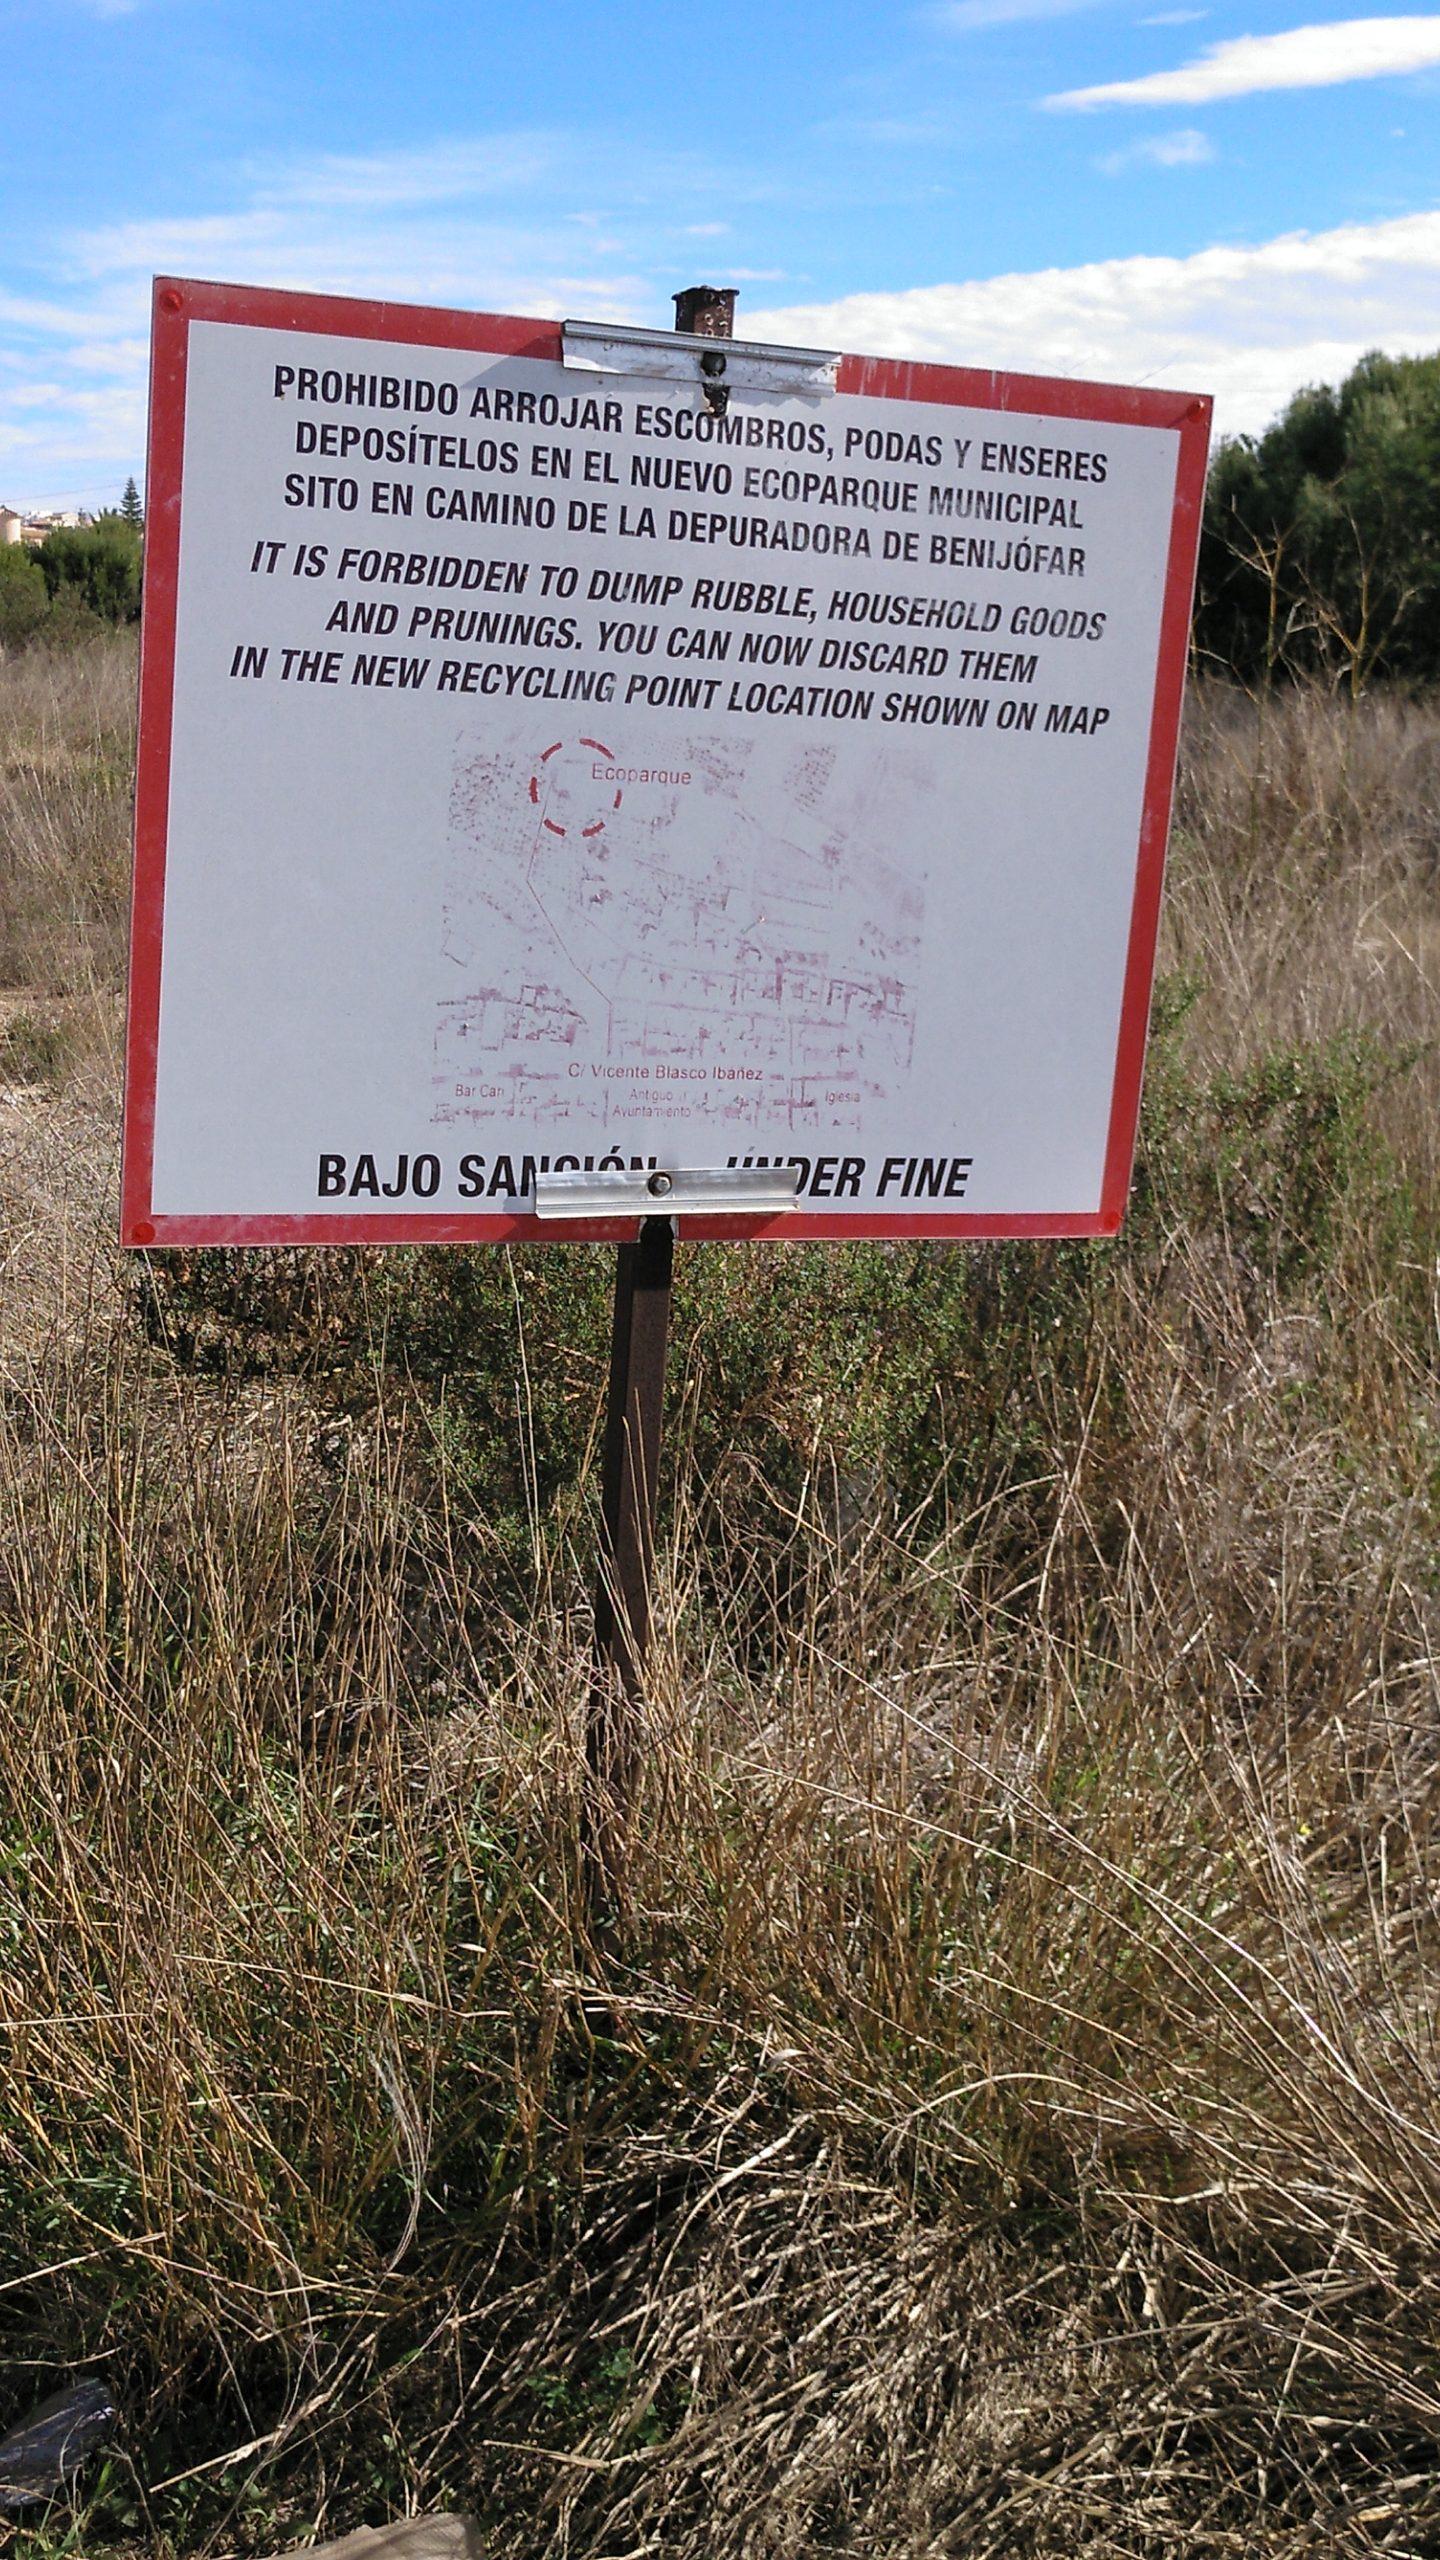 Illegal dumping of waste in Benijofar